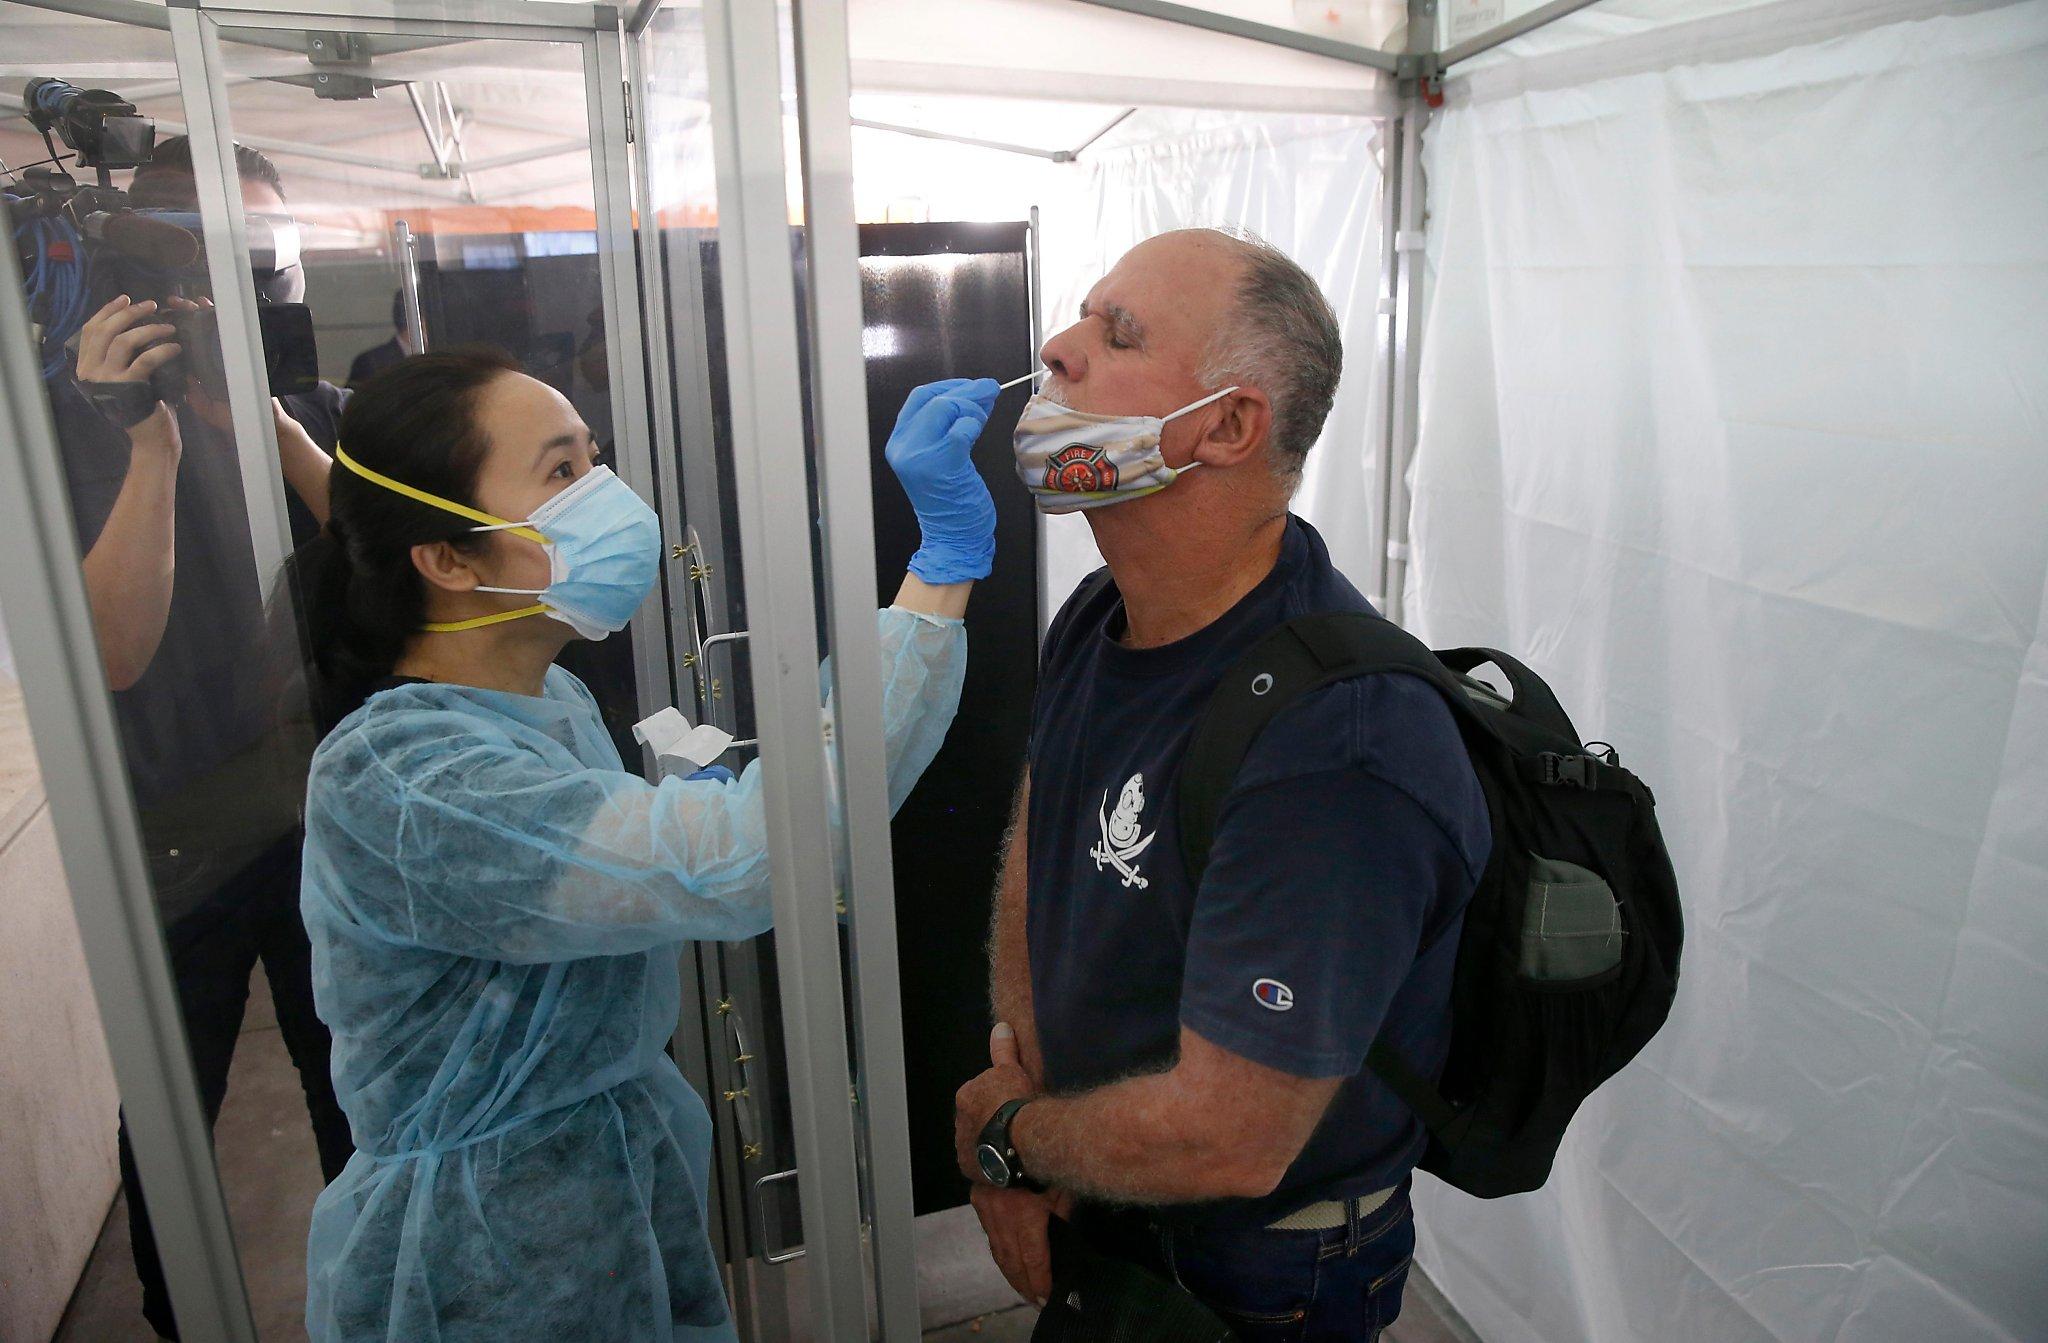 California to double coronavirus testing capacity by spring, governor says - San Francisco Chronicle